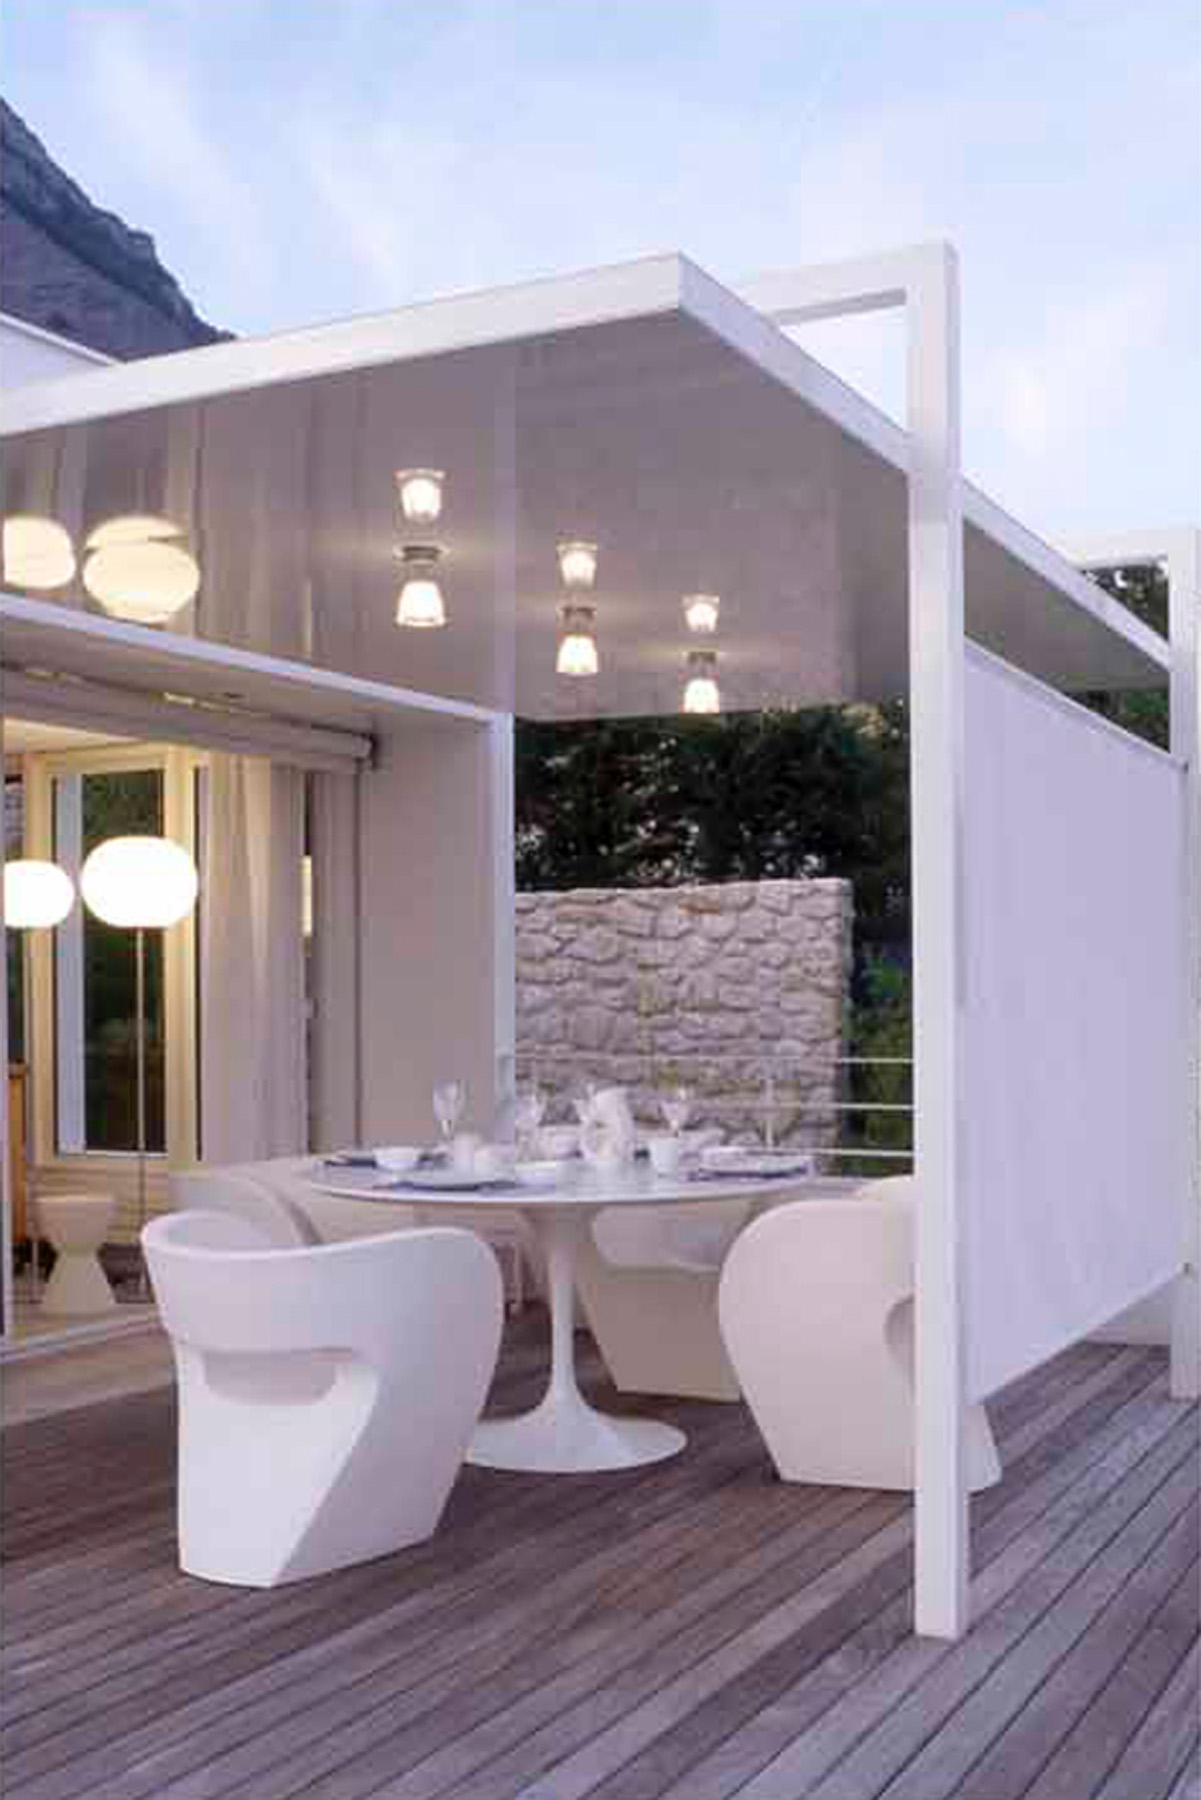 Janik architecte maison individuelle meylan 2 - Architecte grenoble maison individuelle ...